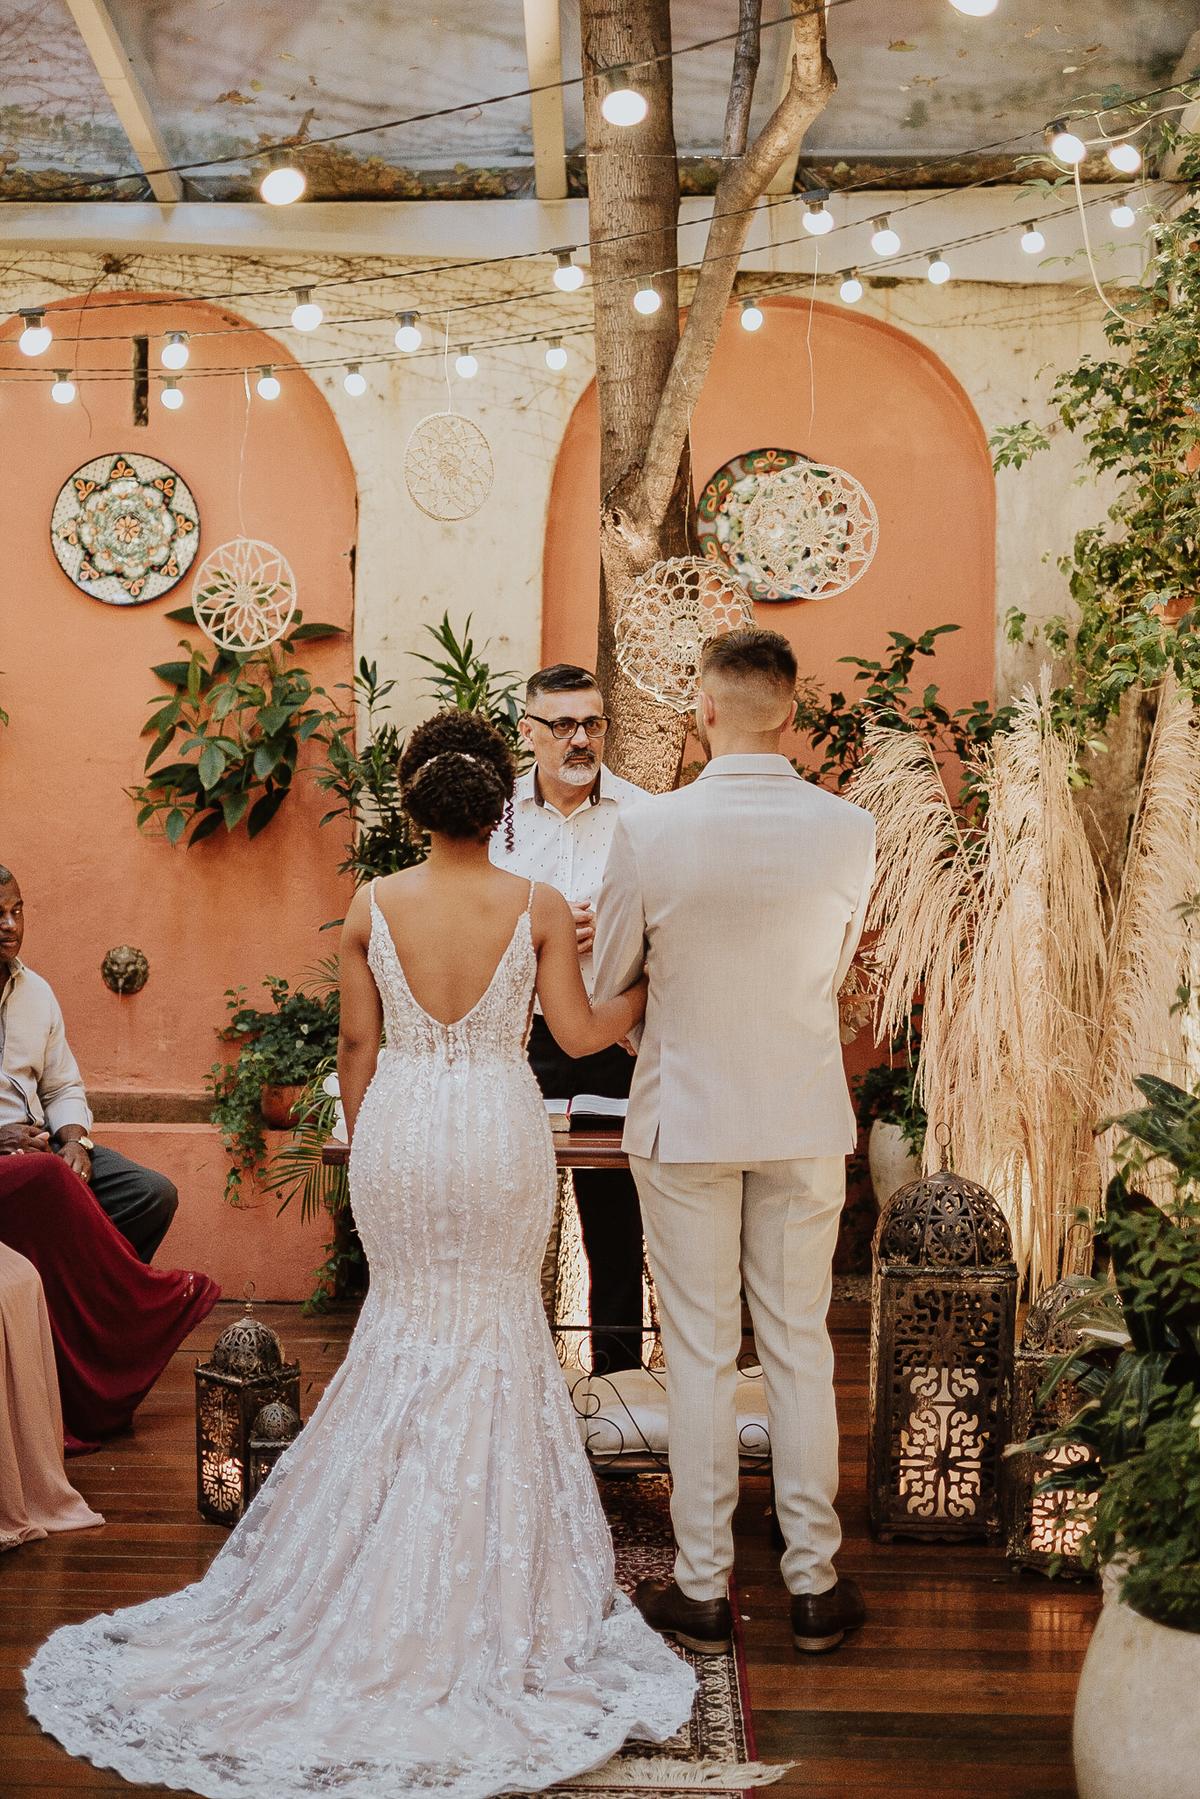 casamentos intimistas elopement wedding noivos no altar ideias para casar decoracao de casamento cerimonias intimistas